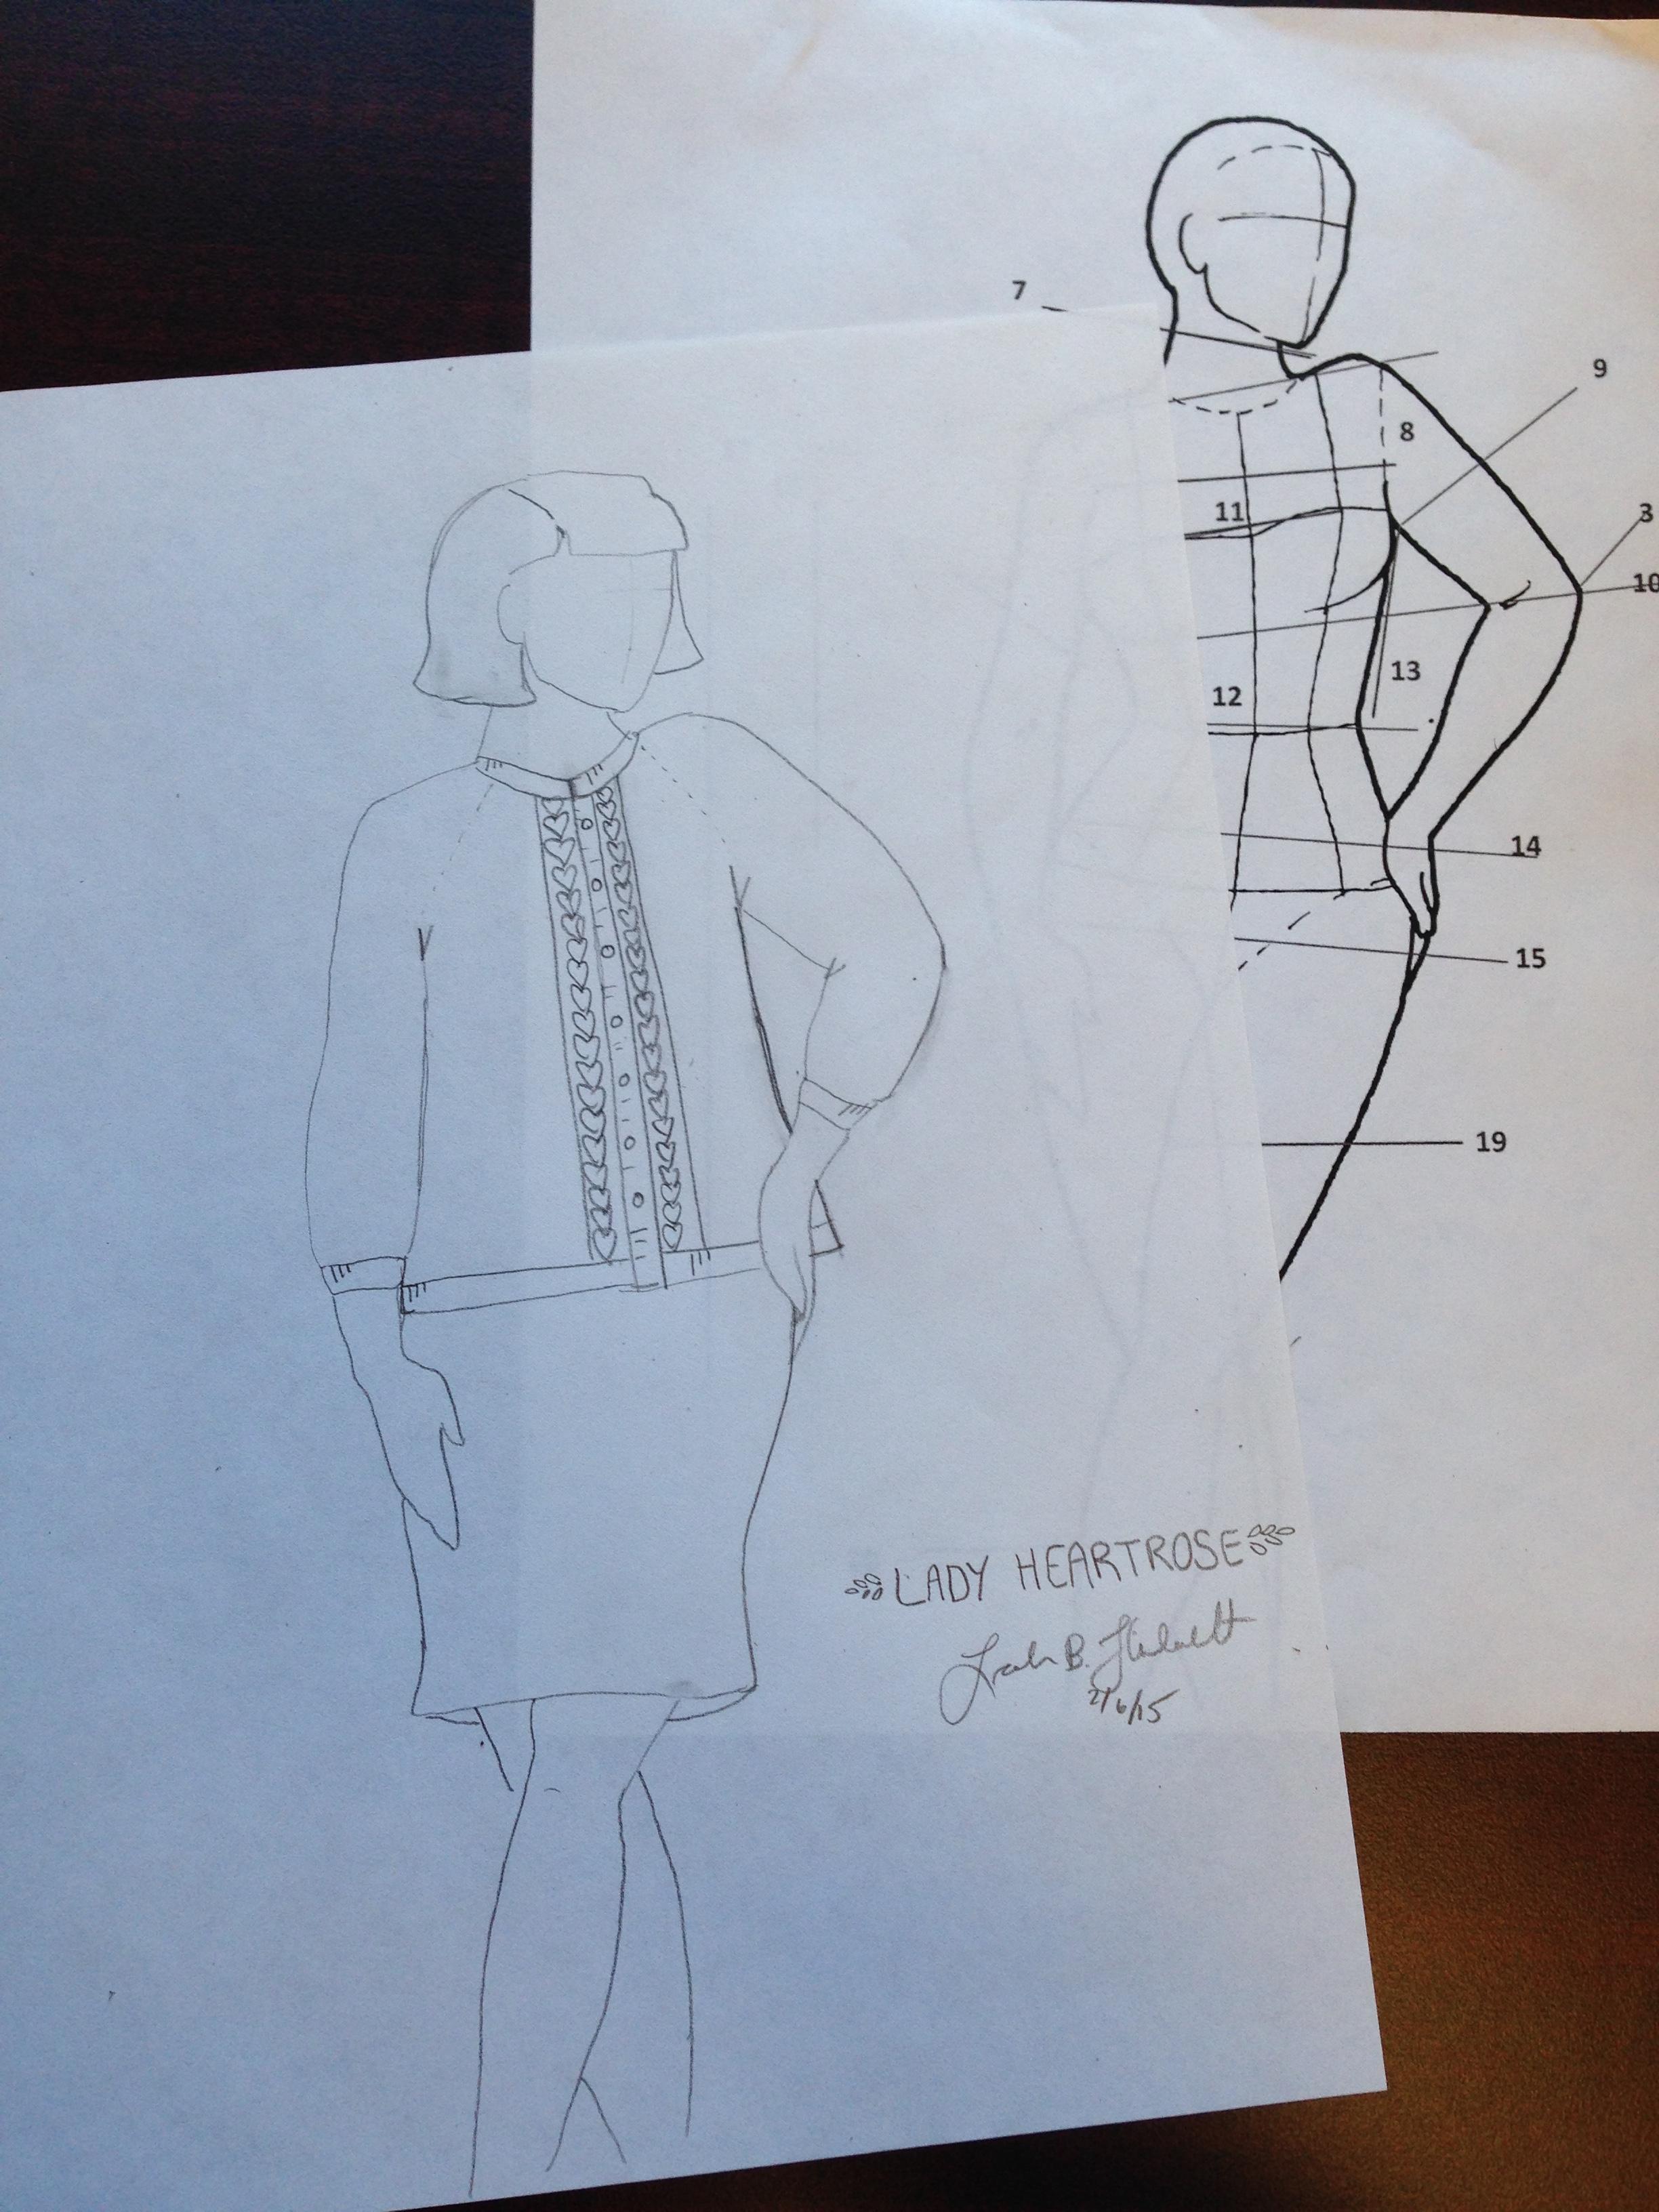 Lady Heartrose Sketch